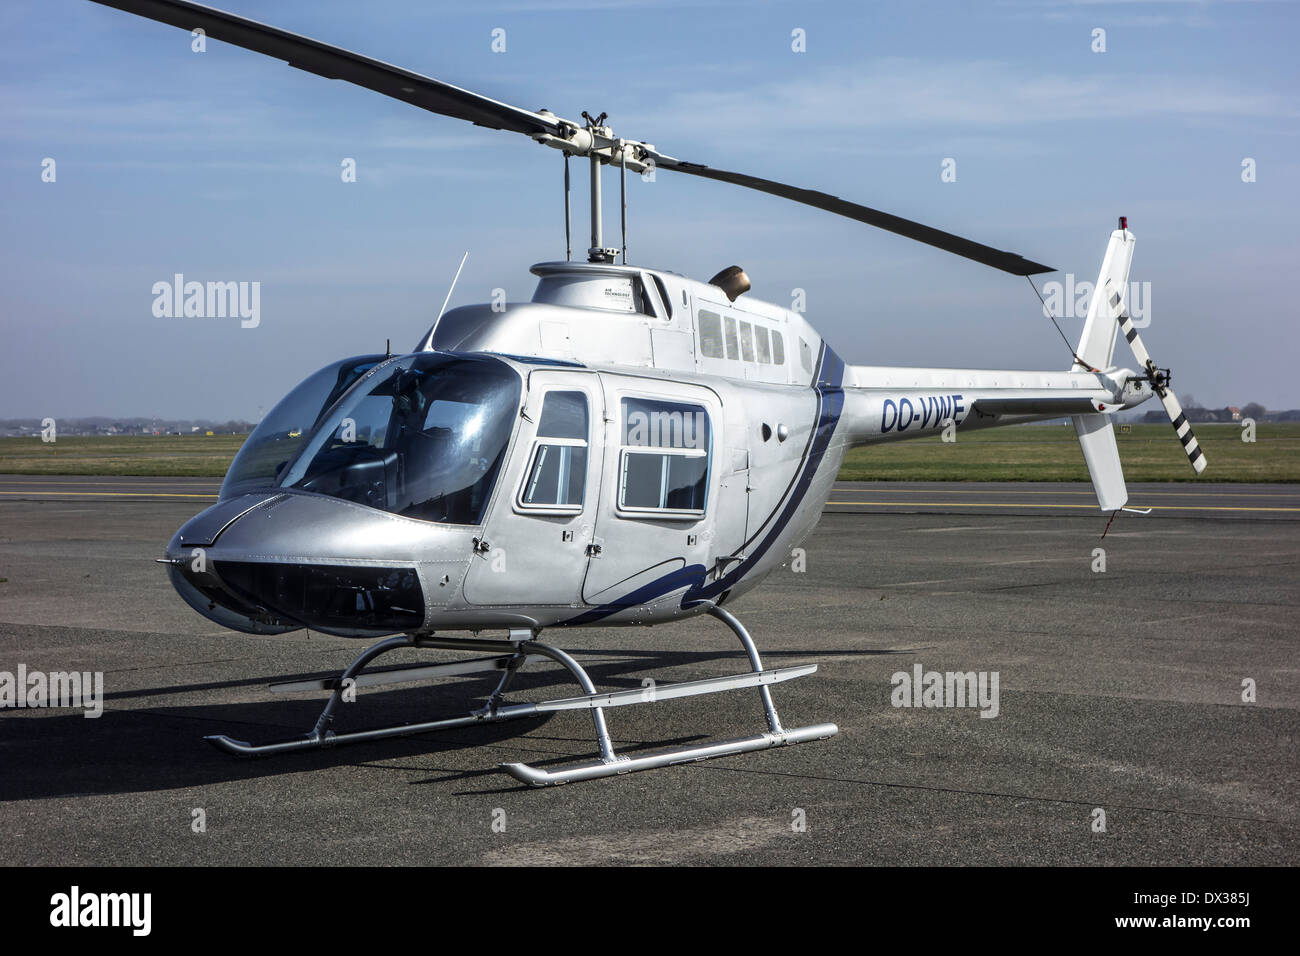 Elicottero Jet Ranger : Cinque luogo augusta ab b jetranger ii elicottero foto